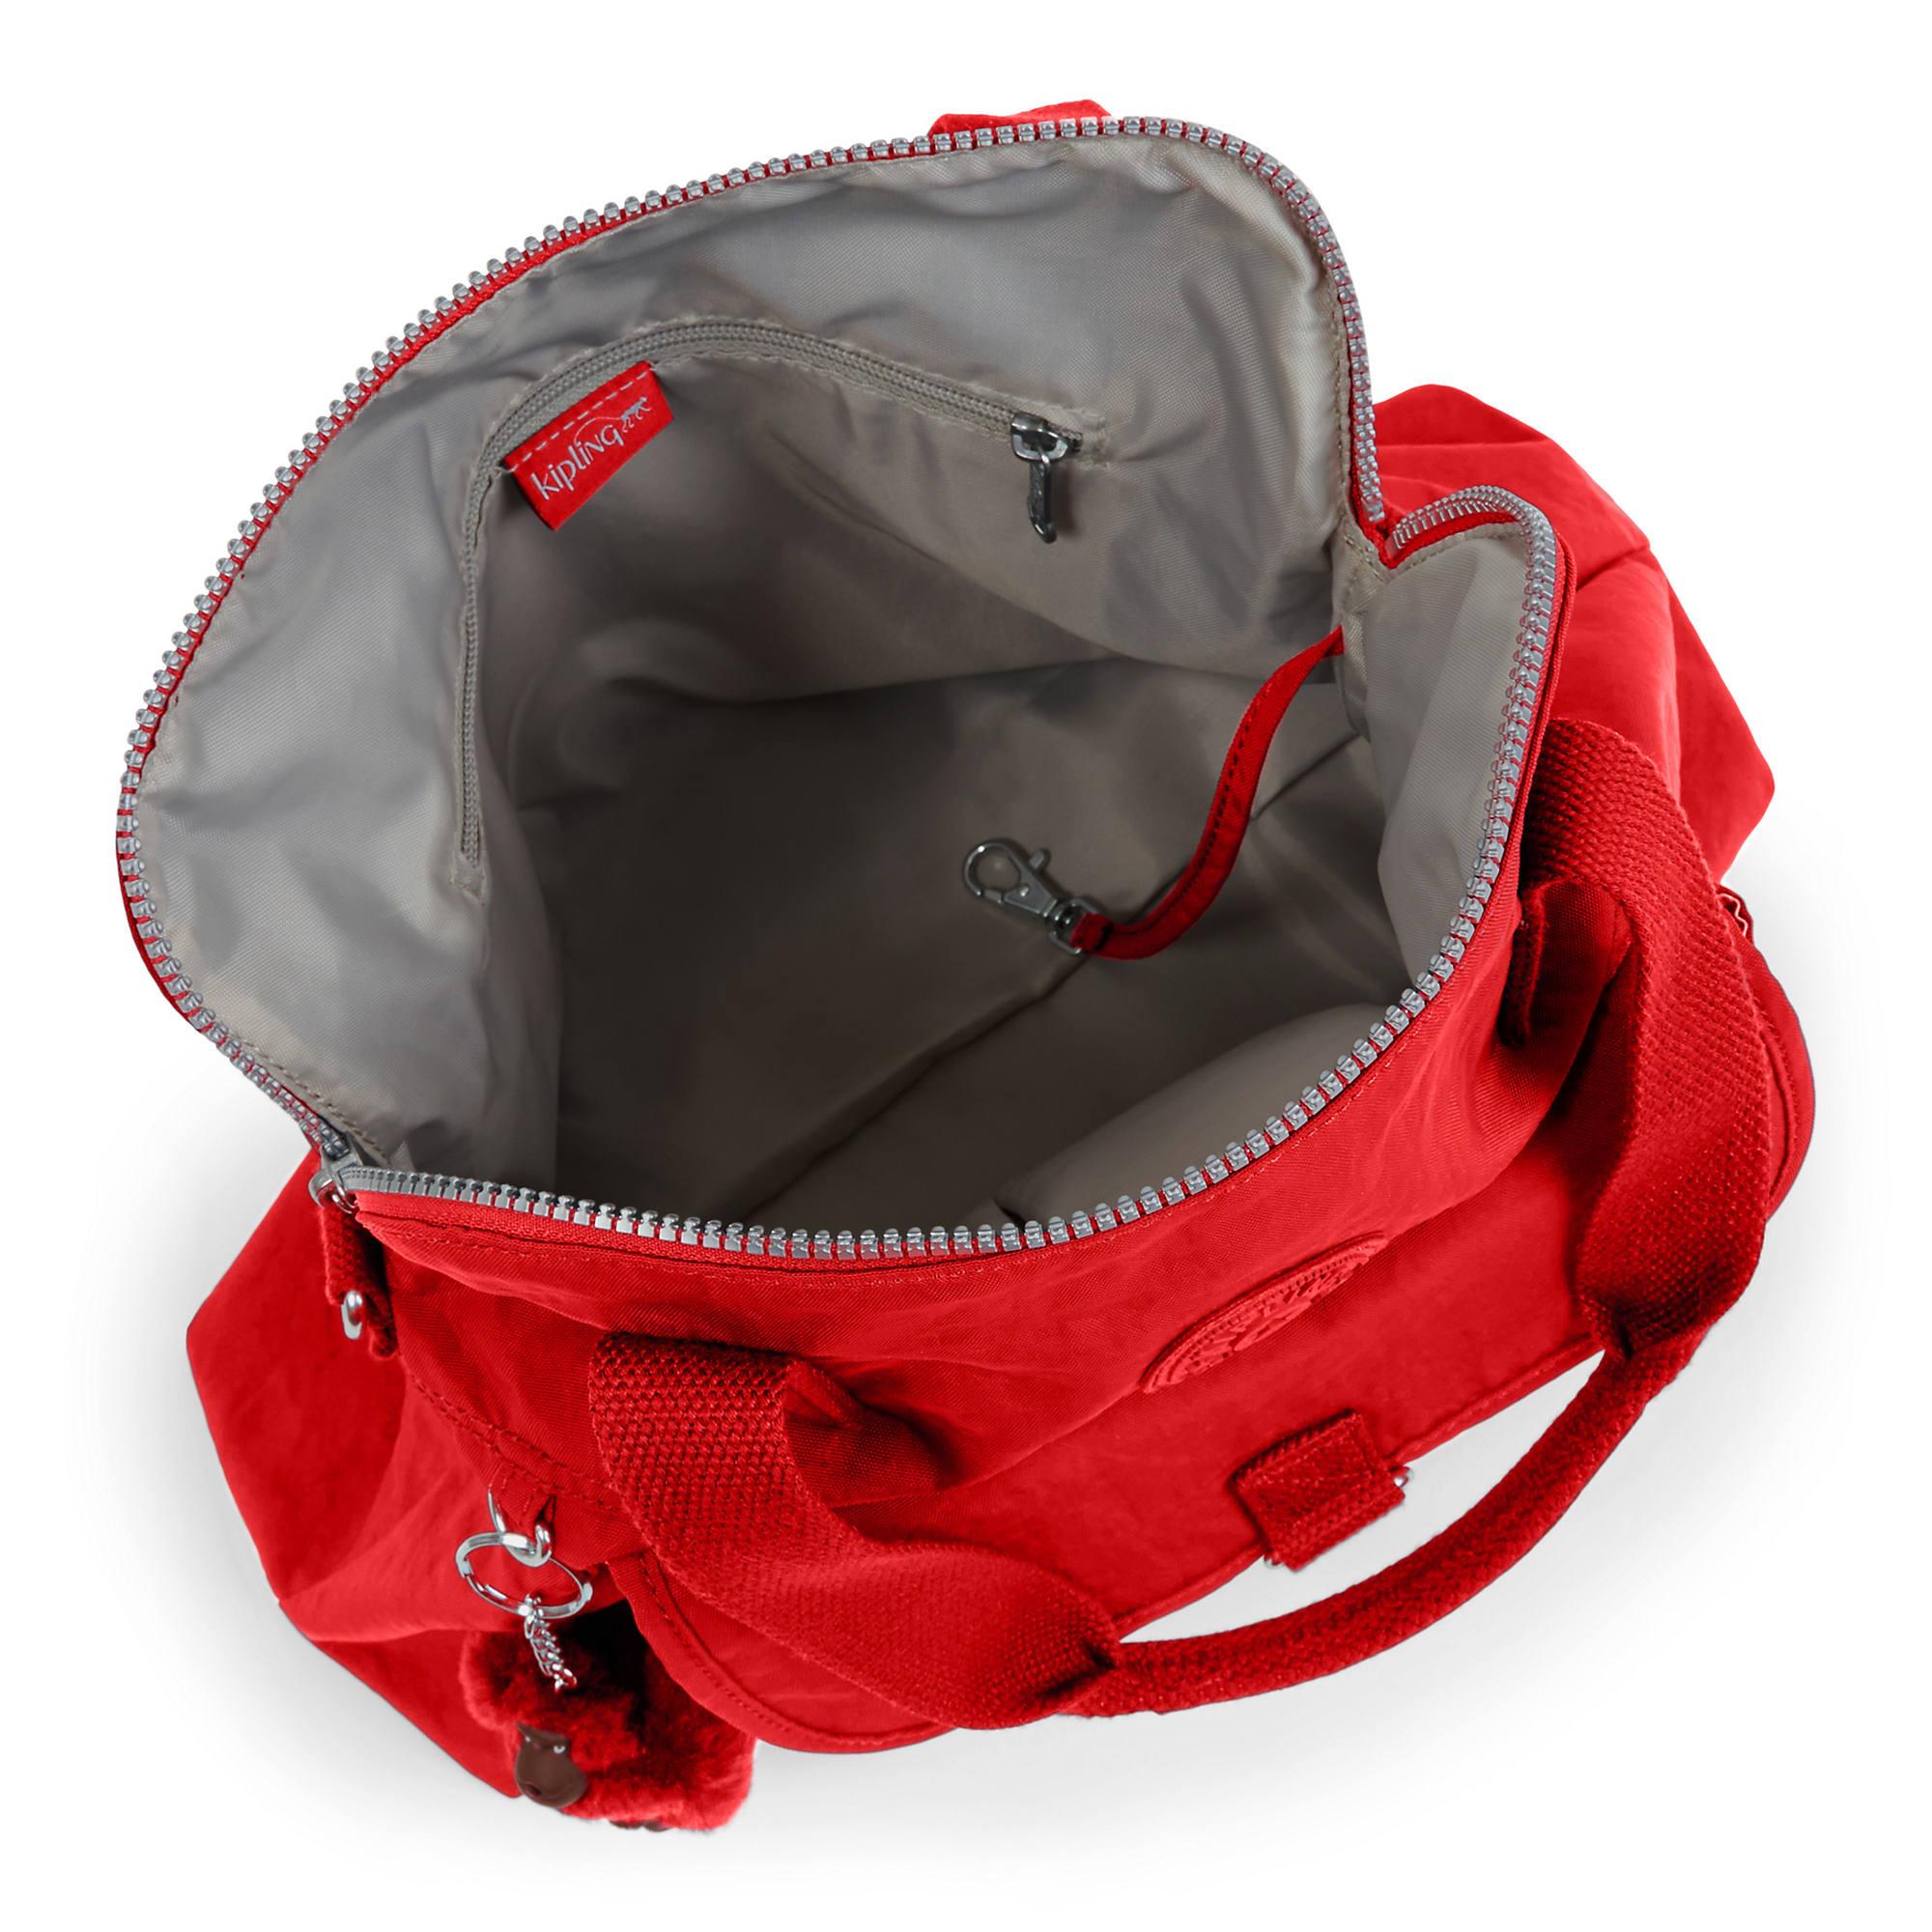 Pahneiro Handbag Kipling